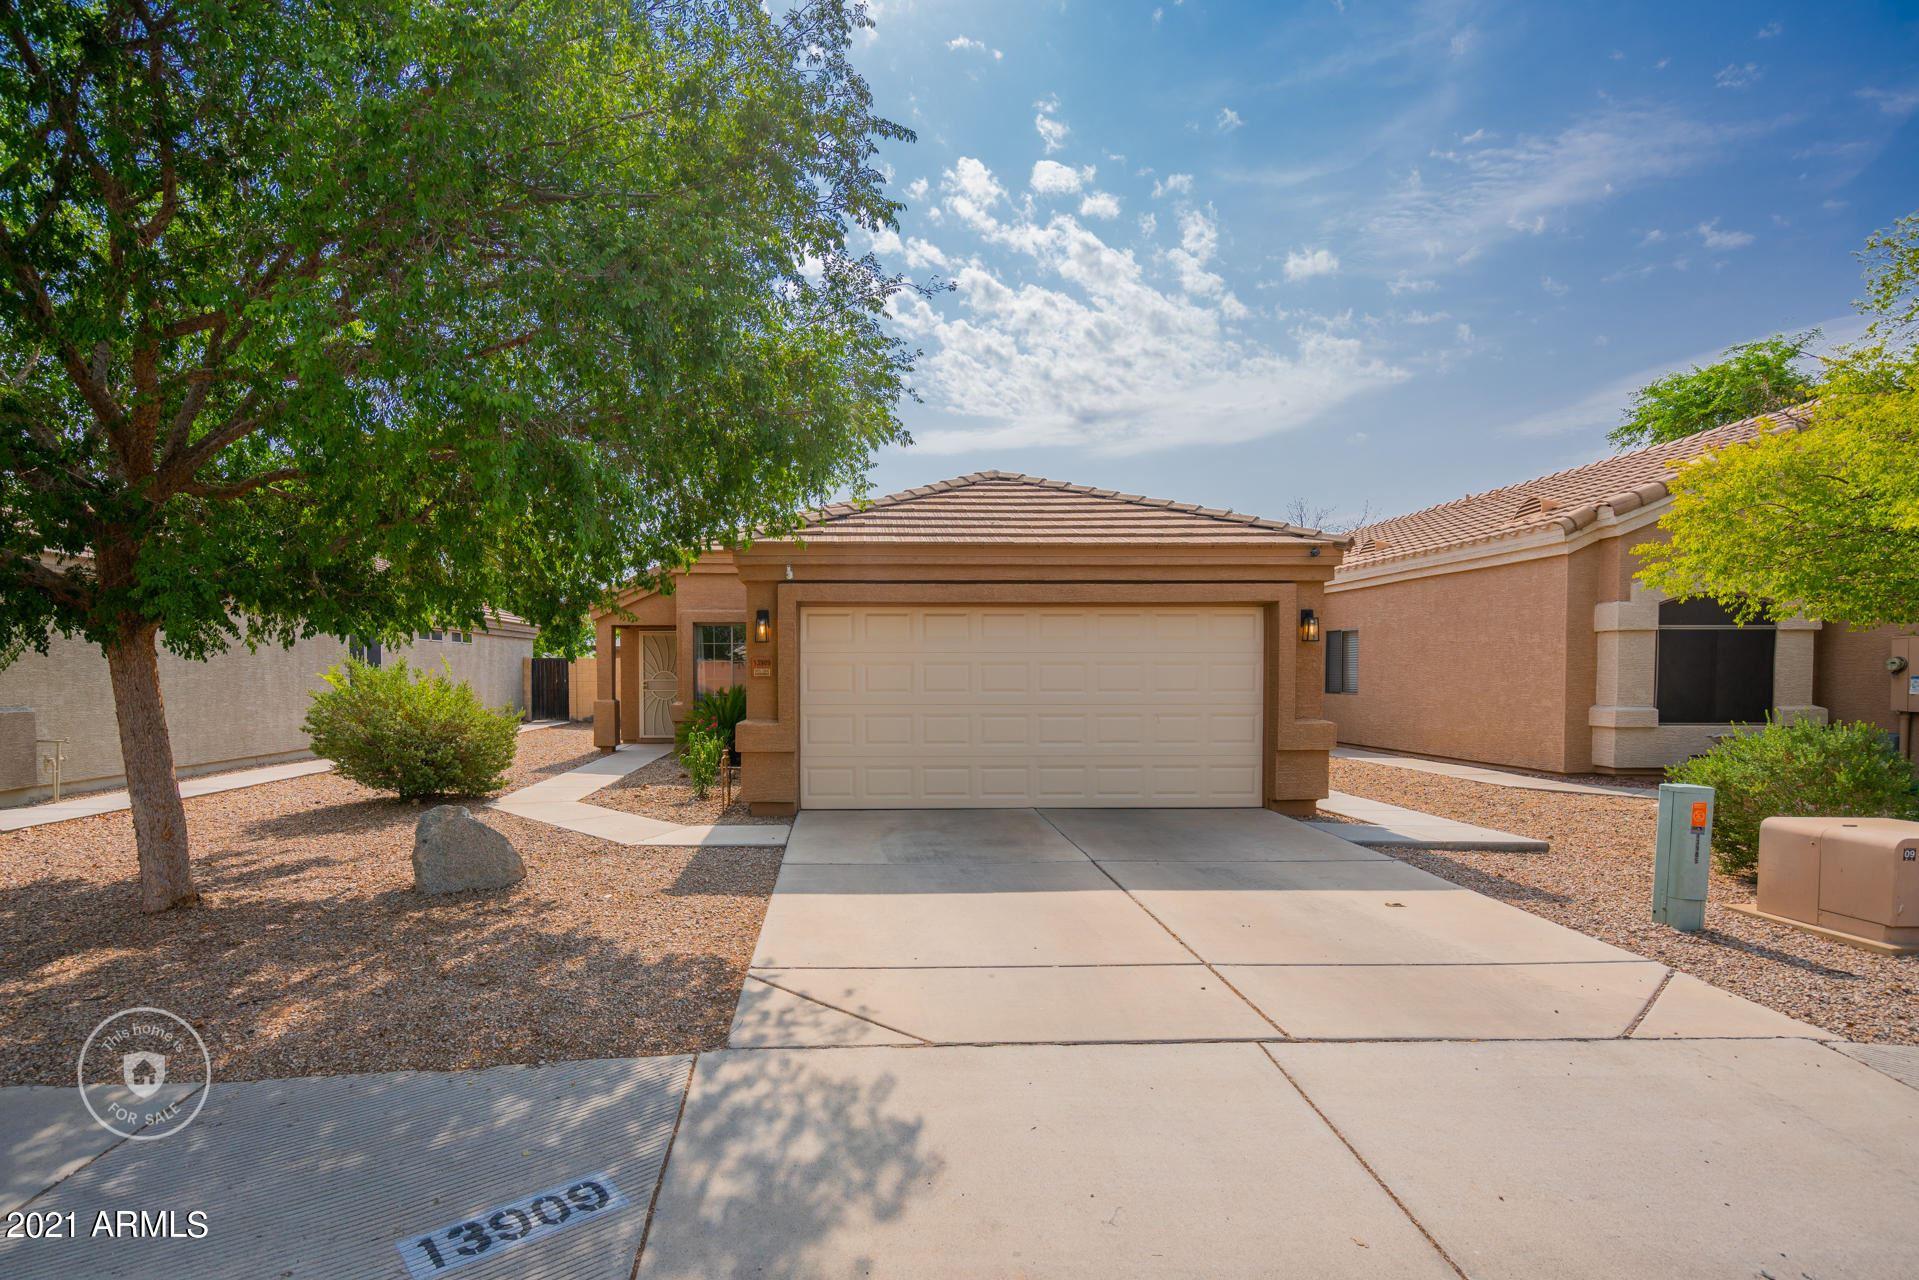 Photo of 13909 N 125TH Drive, El Mirage, AZ 85335 (MLS # 6266742)